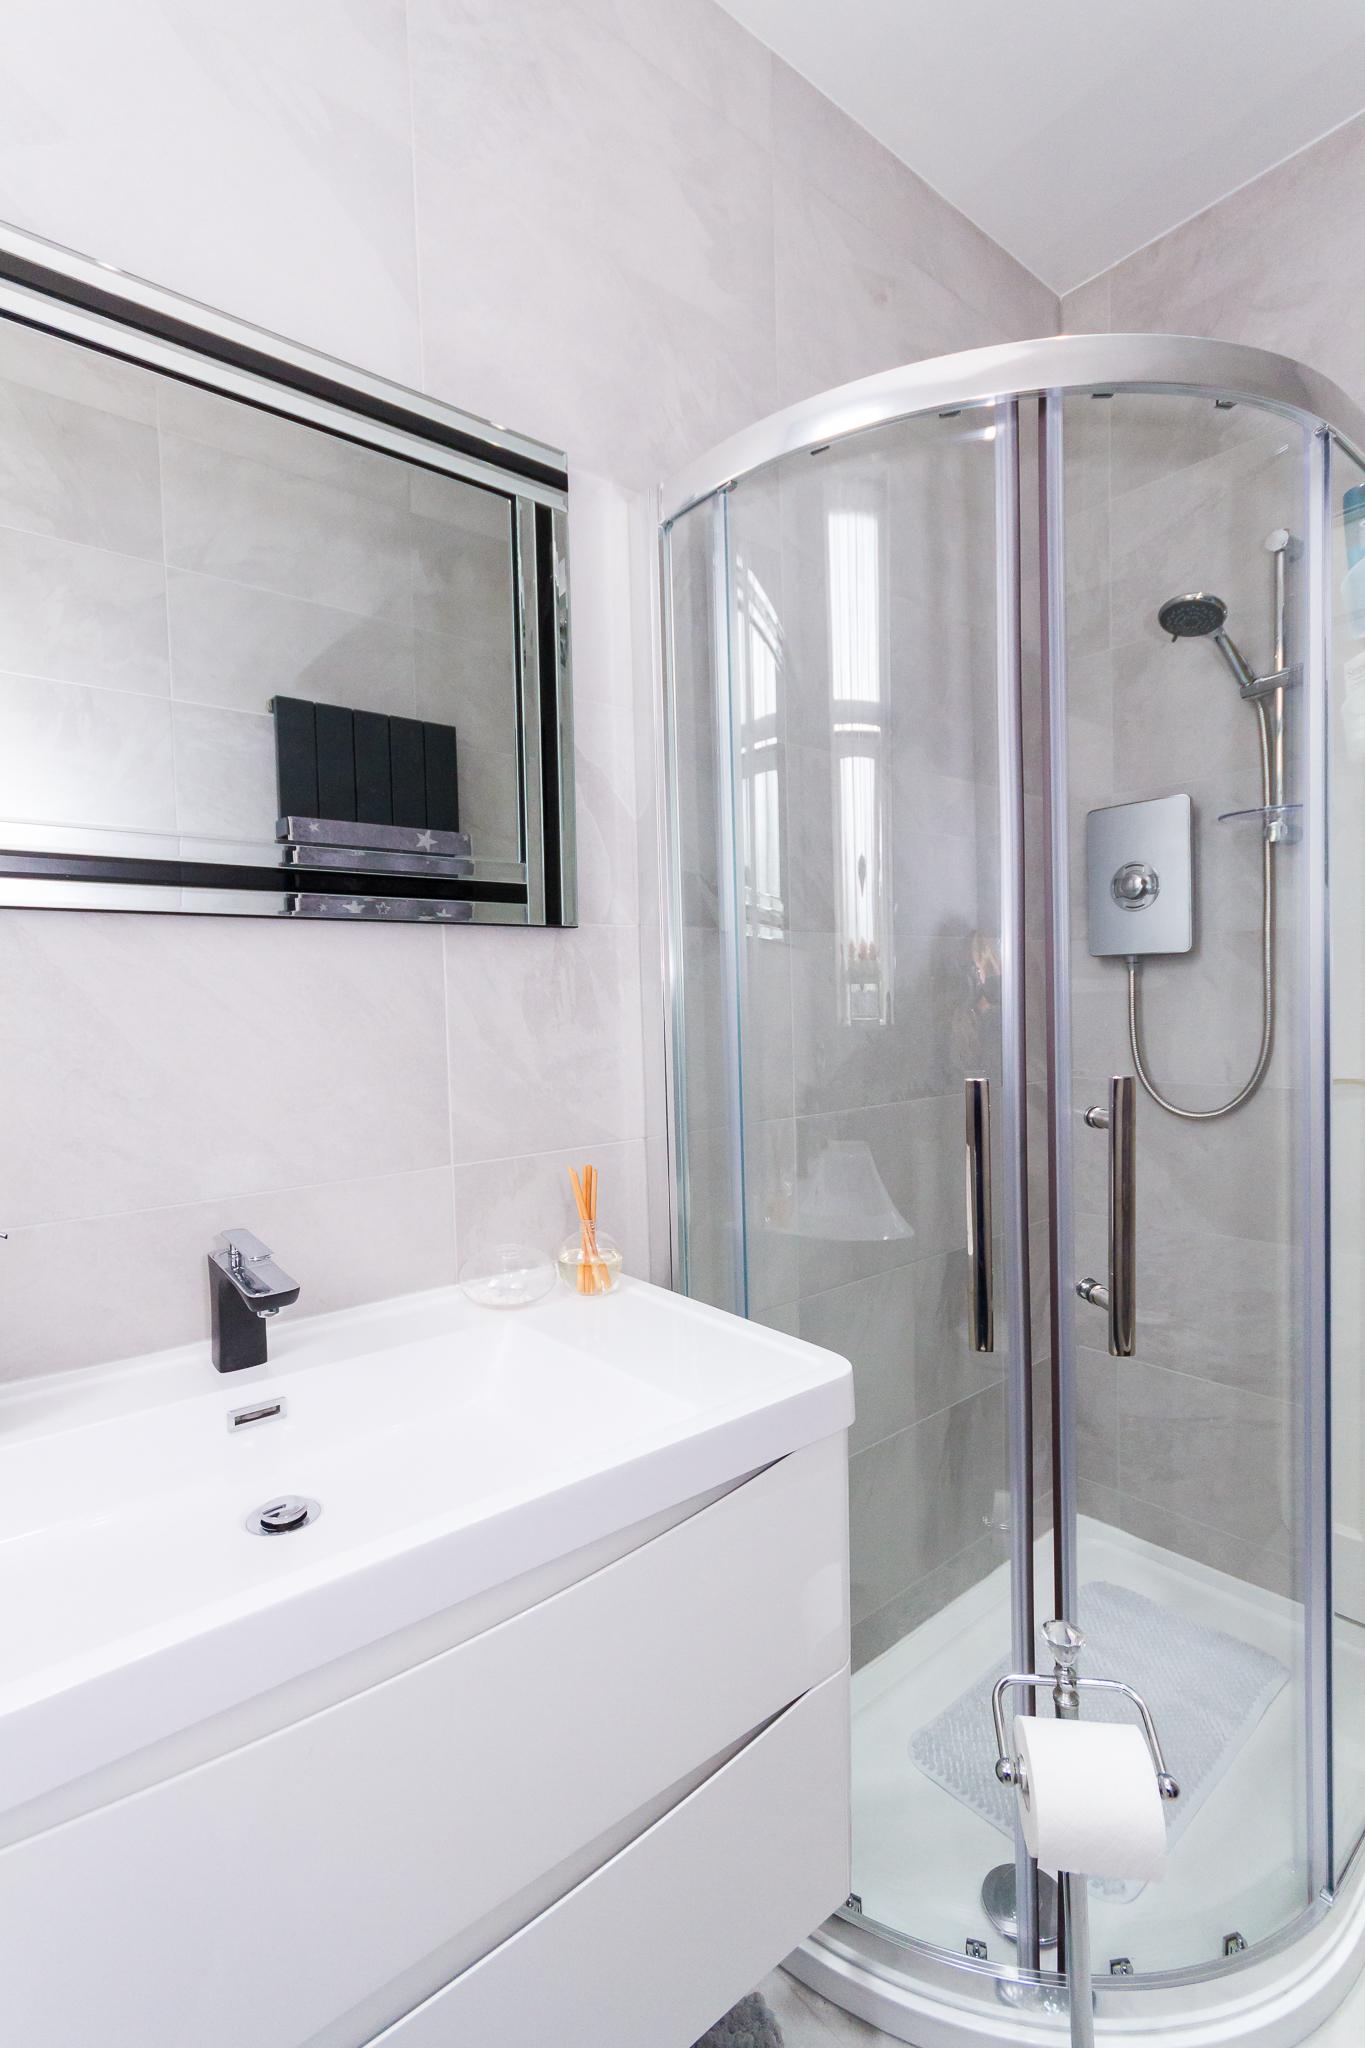 Tillicoultry Bathroom Transformation - Bathroom Centre ...